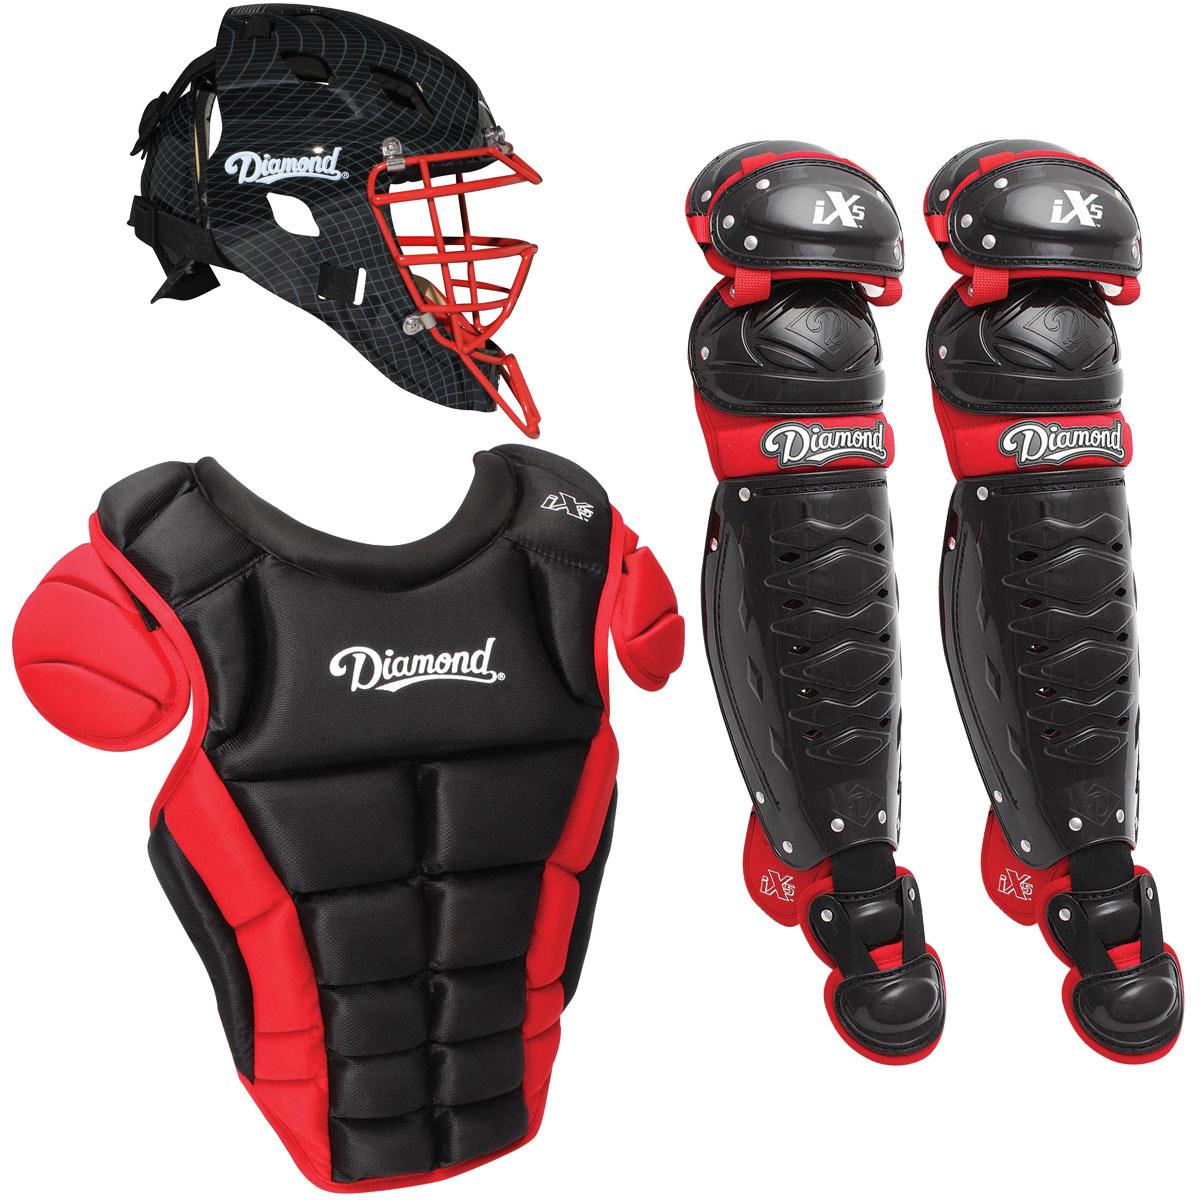 Diamond iX5 Pro Adult Baseball Catcher's Package